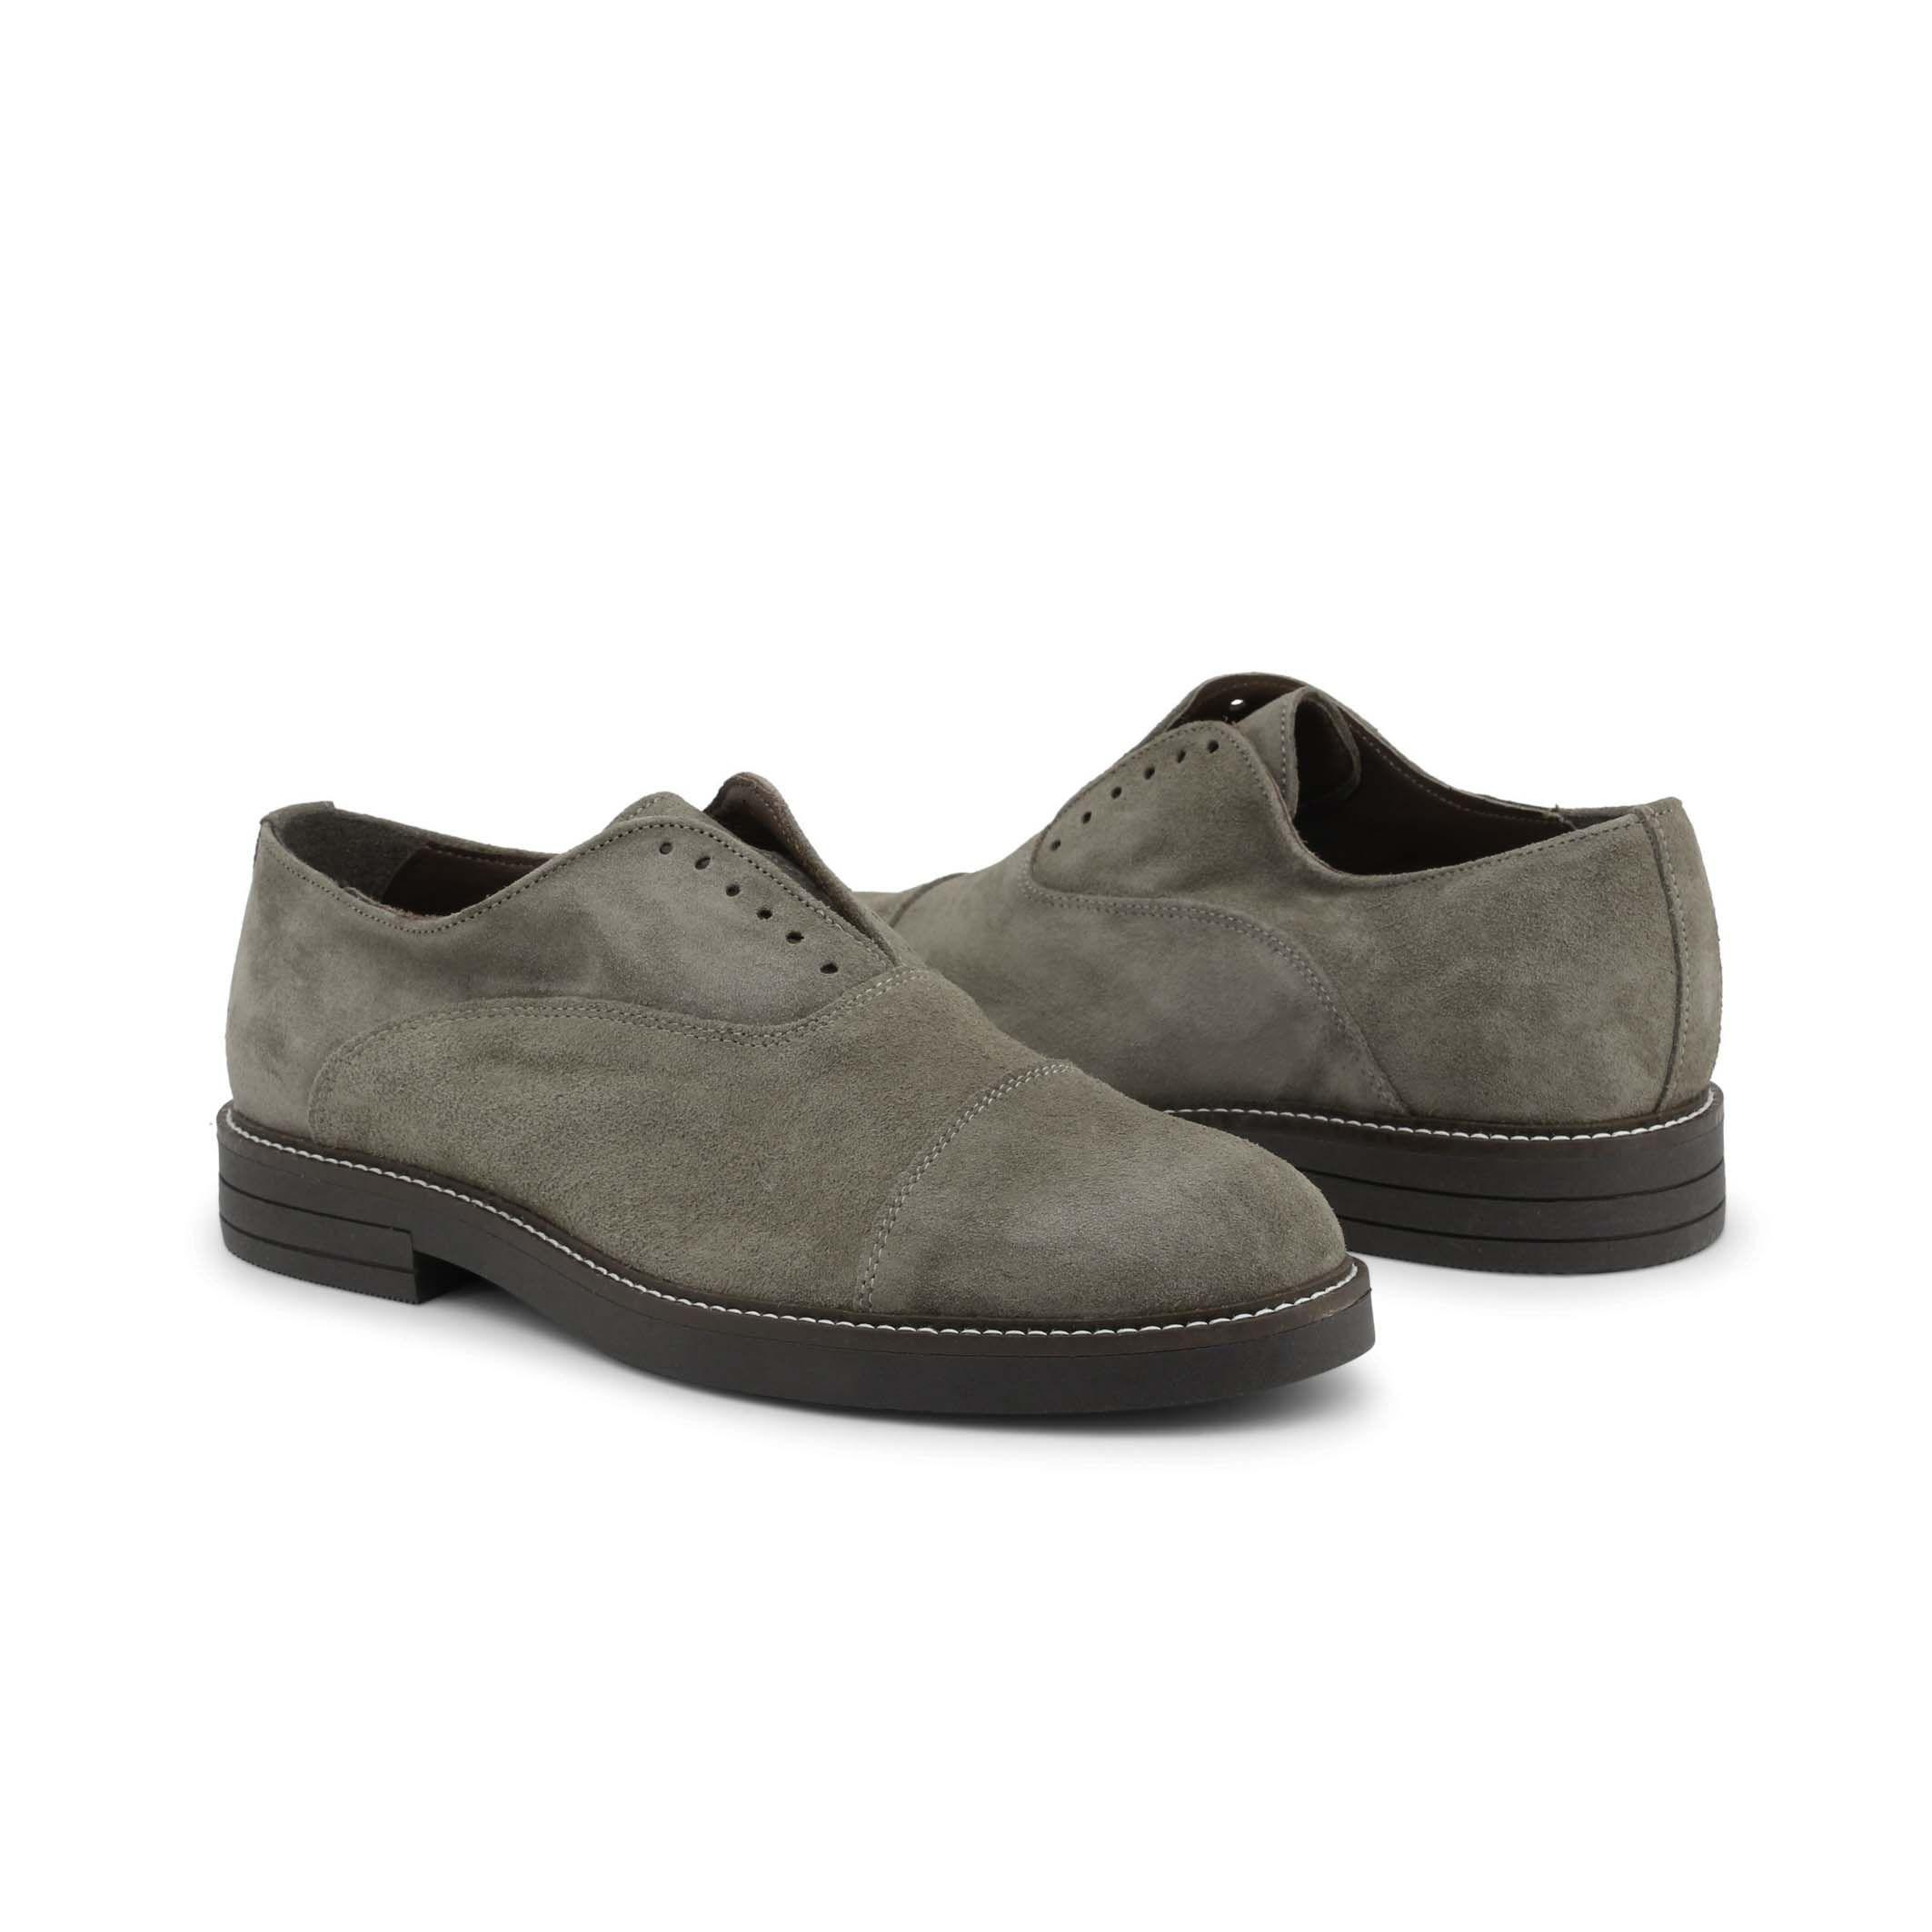 Chaussures Madrid – 700_CAMOSCIO